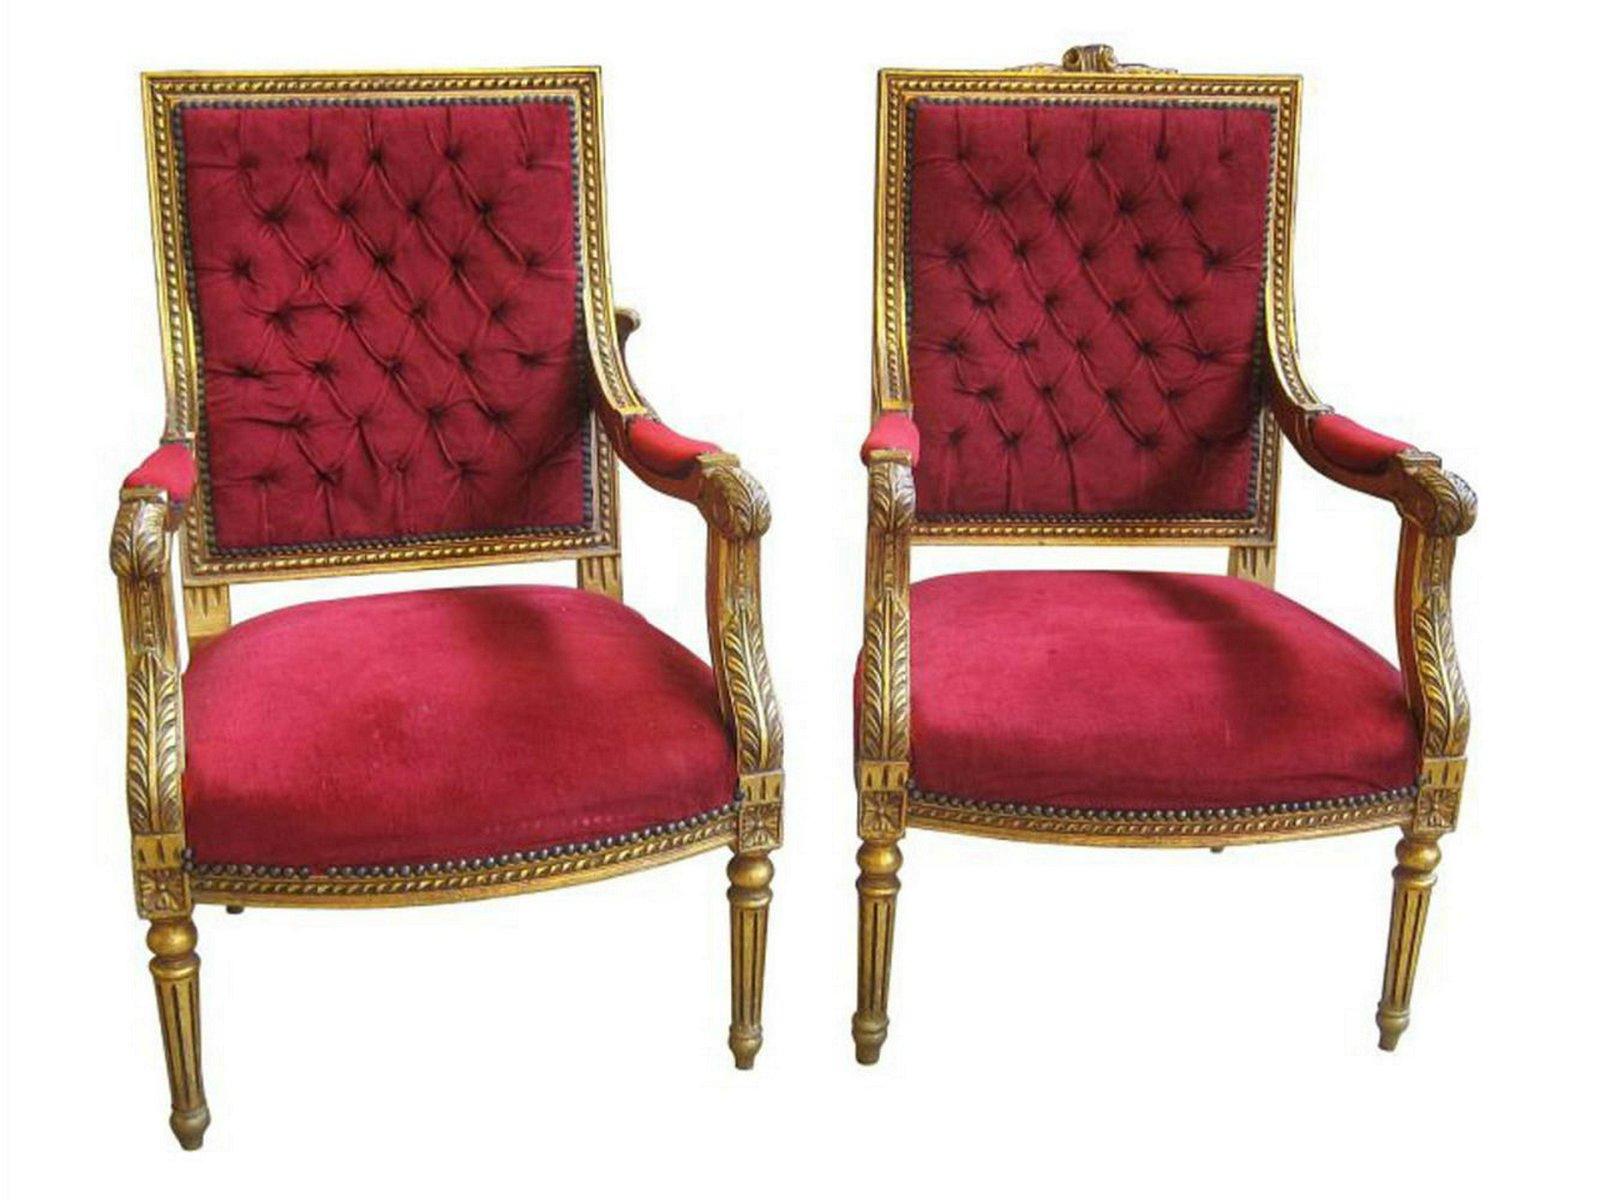 Pair of Louis XVI-style armchairs